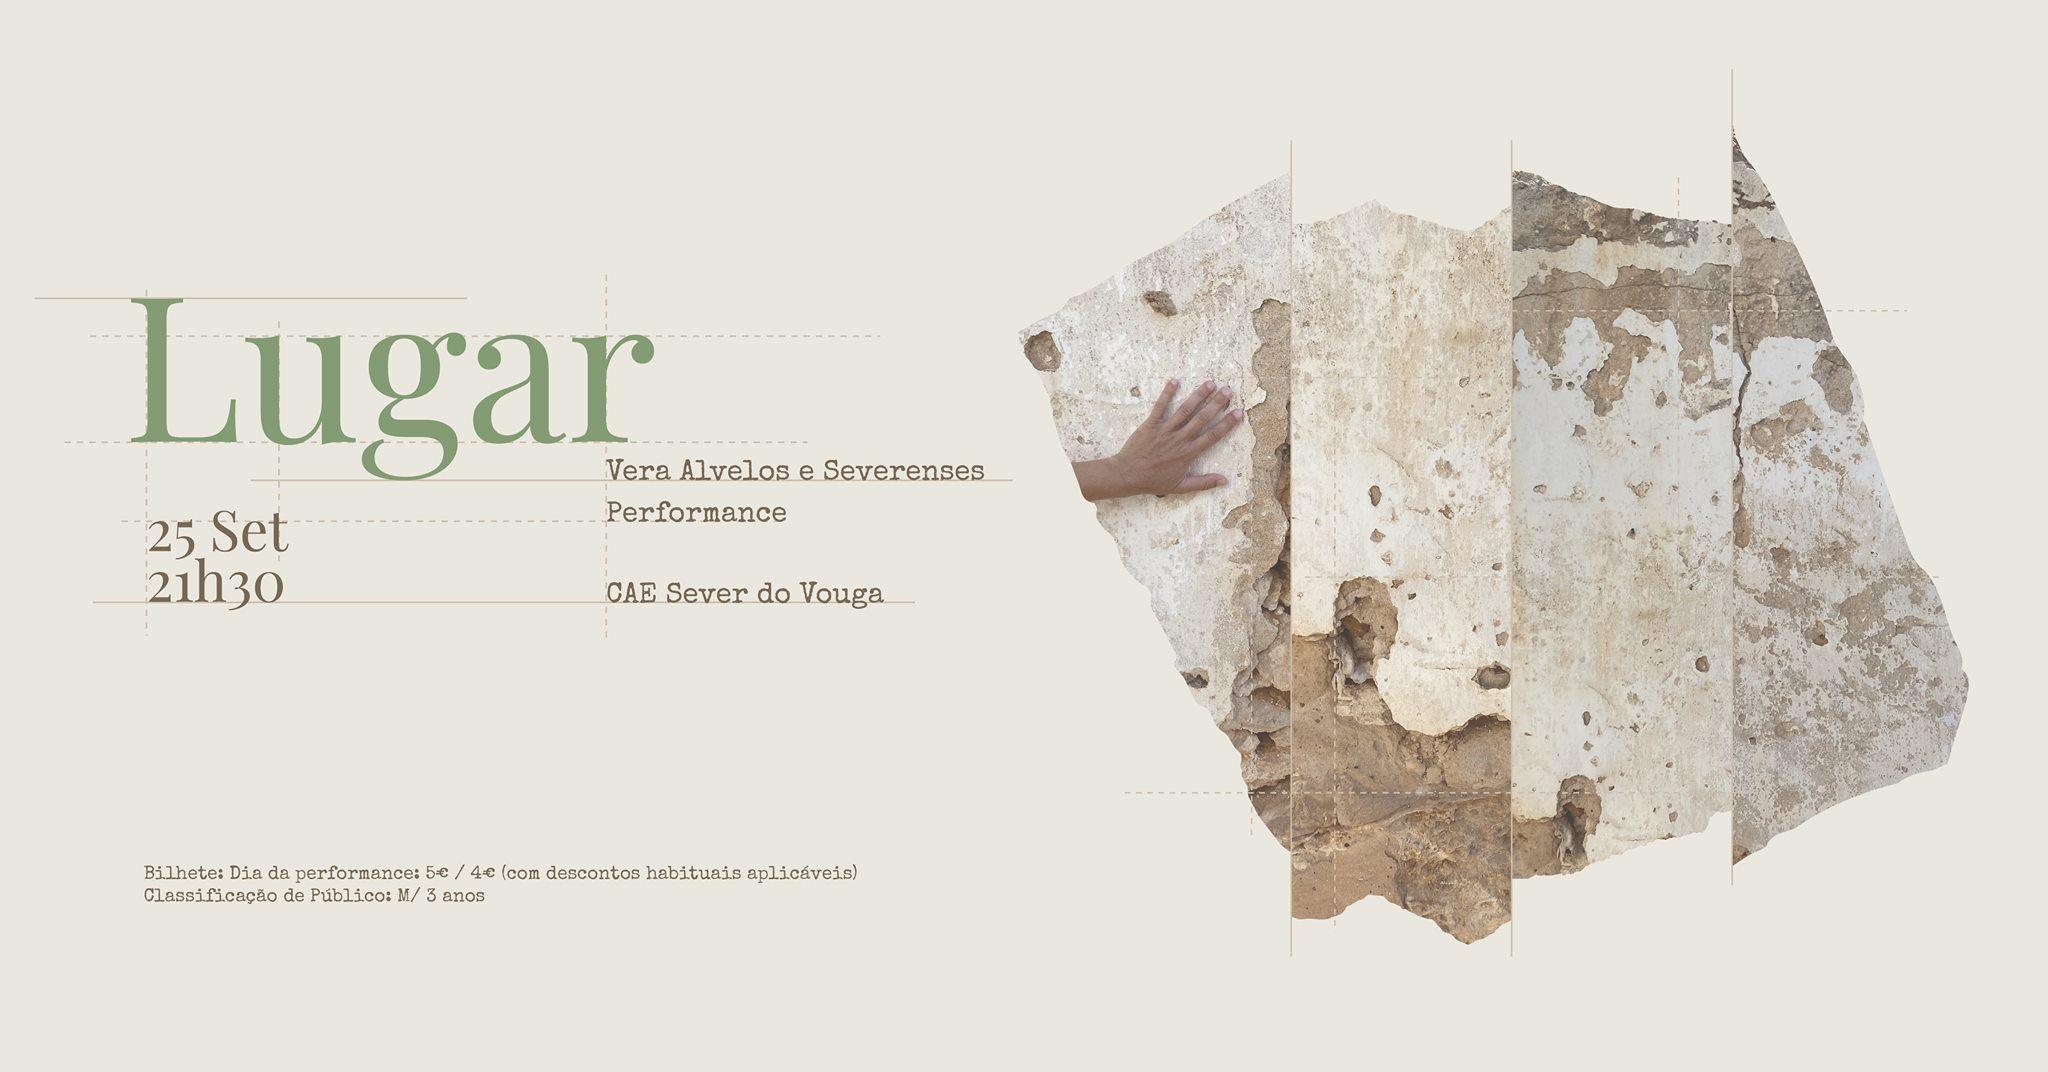 PERFORMANCE: 'LUGAR' - Vera Alvelos